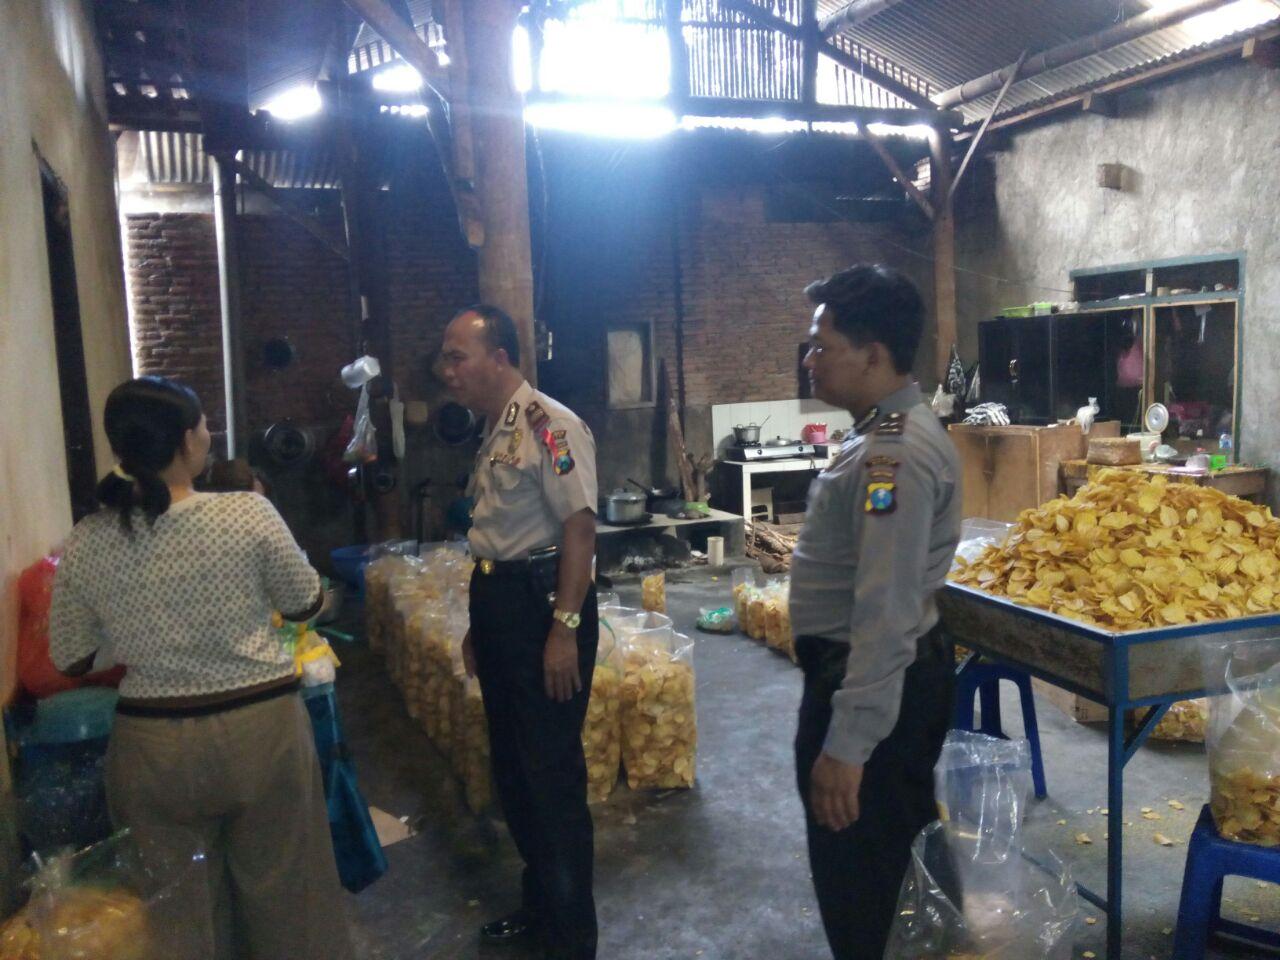 Kapolsek Ngantang Polres Batu Bersama Anggota Giatkan Sambang Kepada Warga Pengusaha Kripik Talas